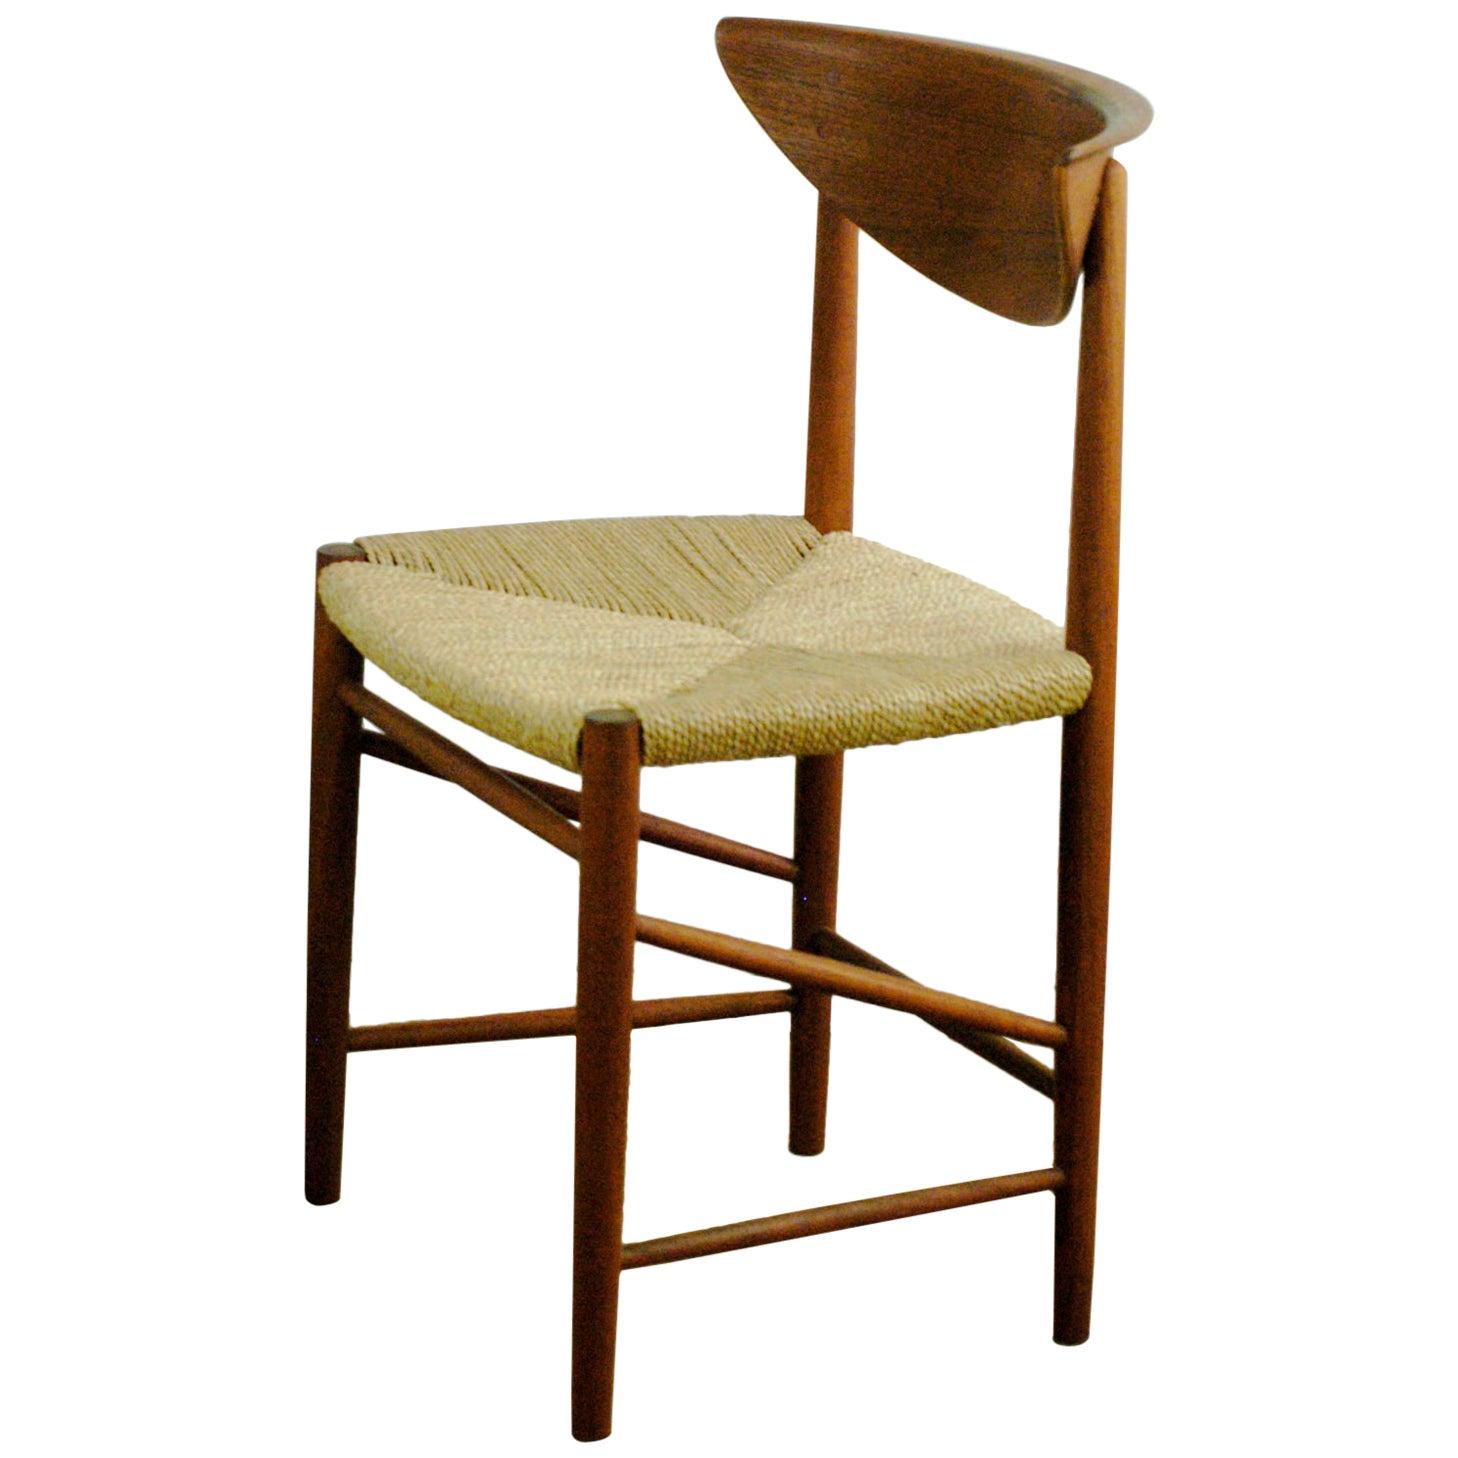 Scandinavian Modern Mod. 316 Teak Dining Chair by Peter Hvidt for Soborg